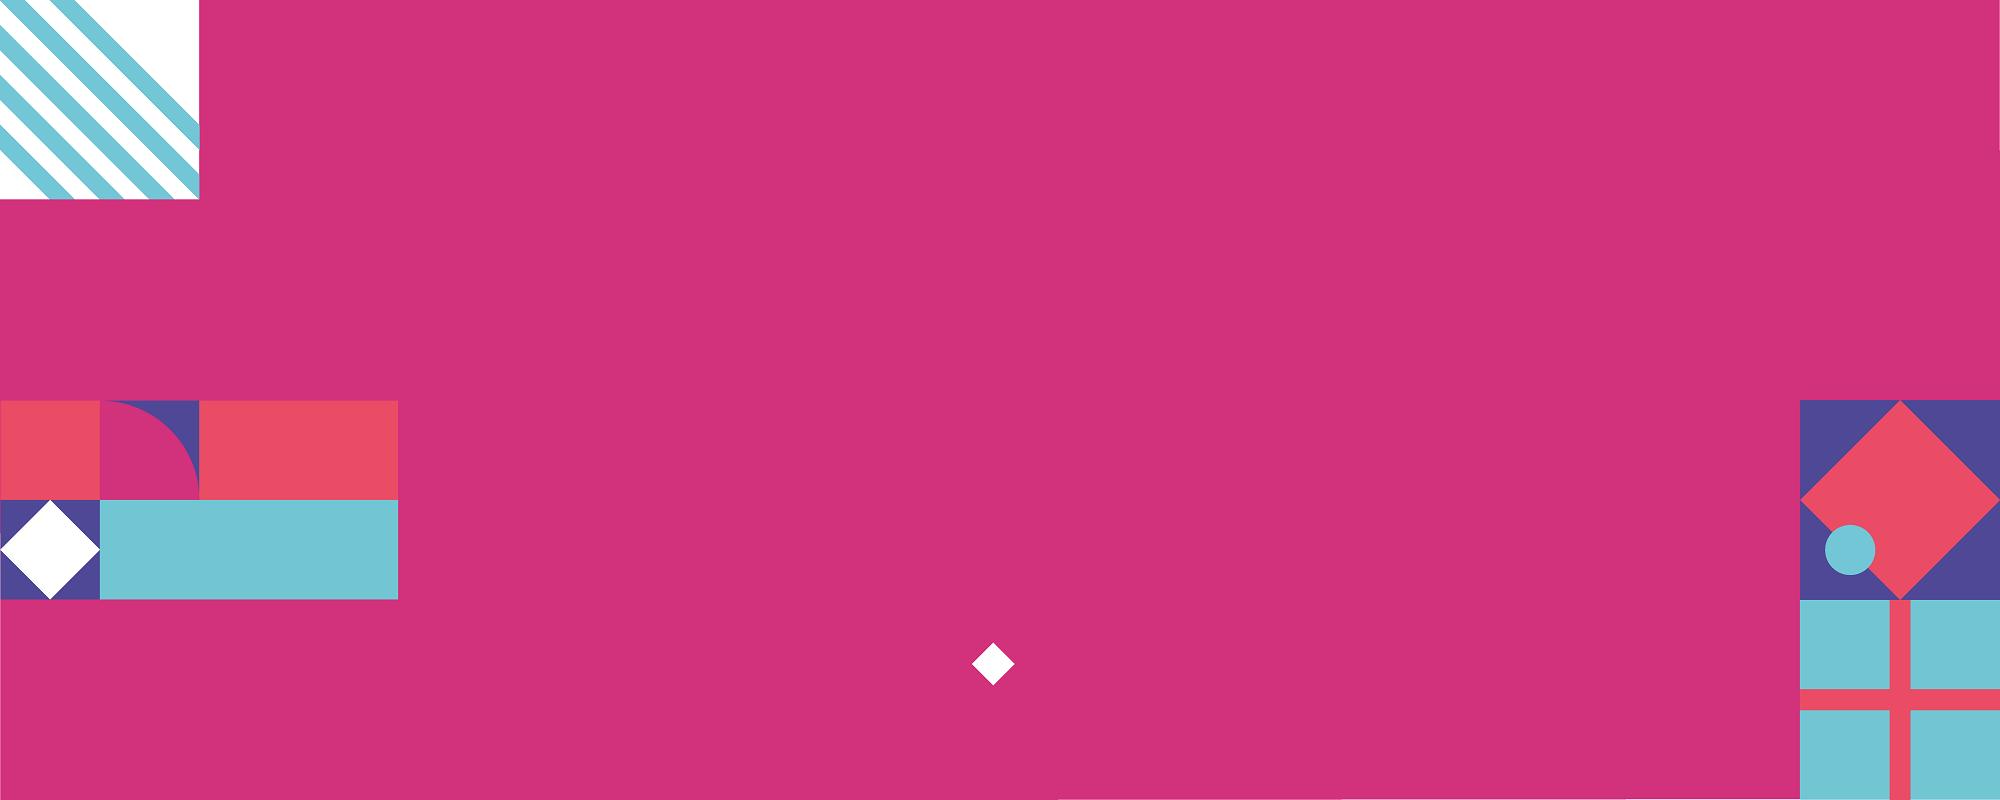 Puzzle_services_banner_content_marketing